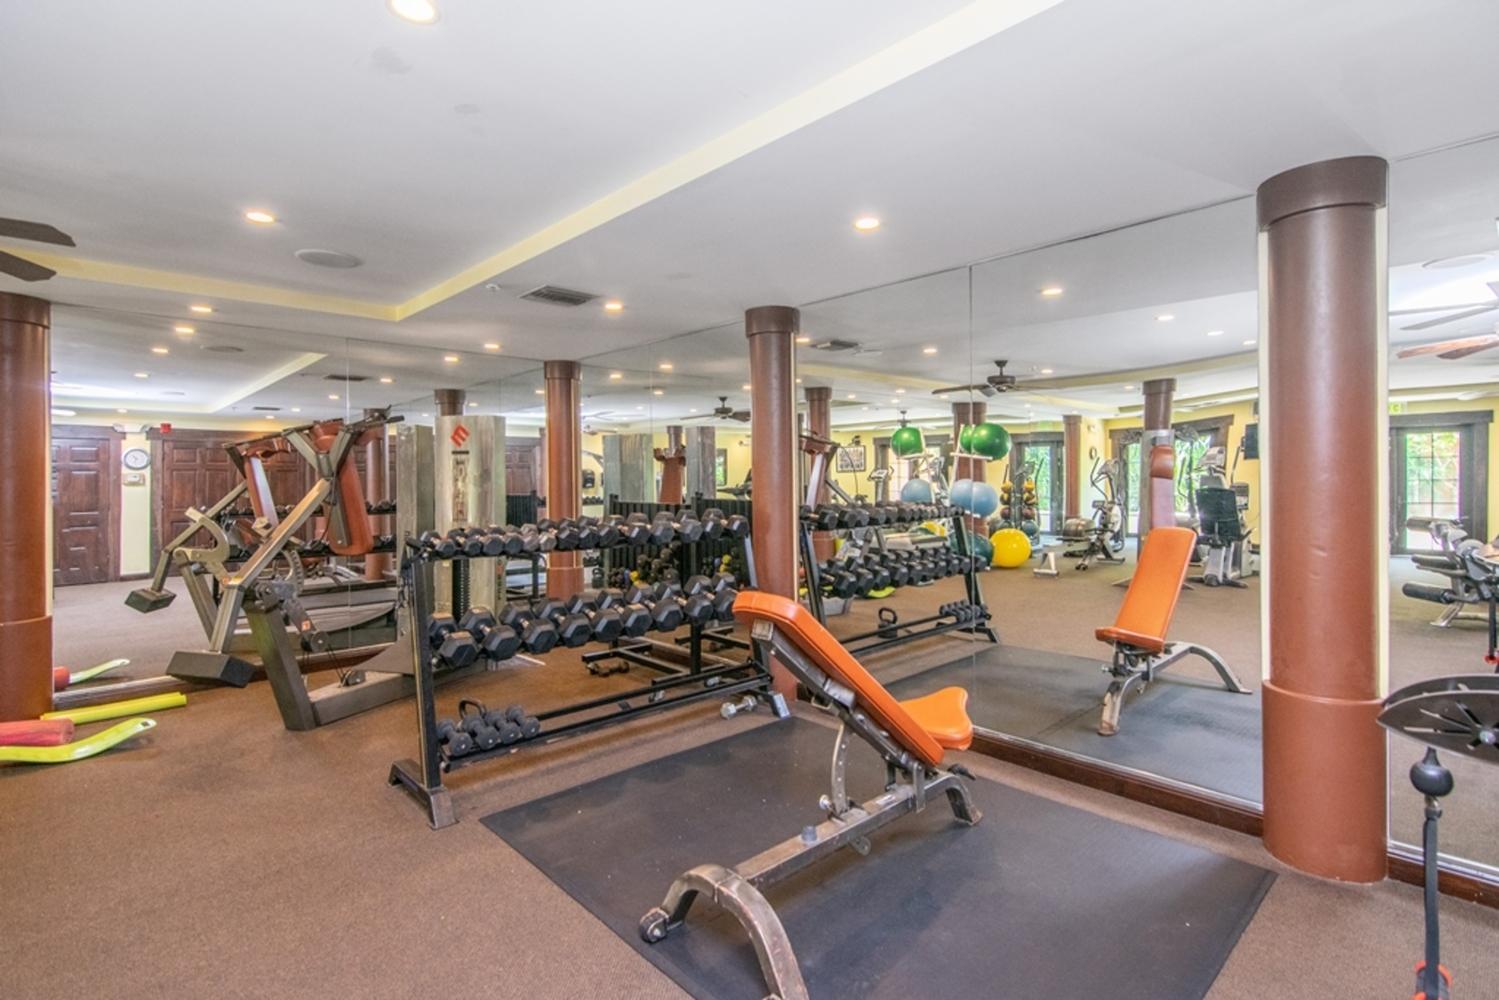 41 gym